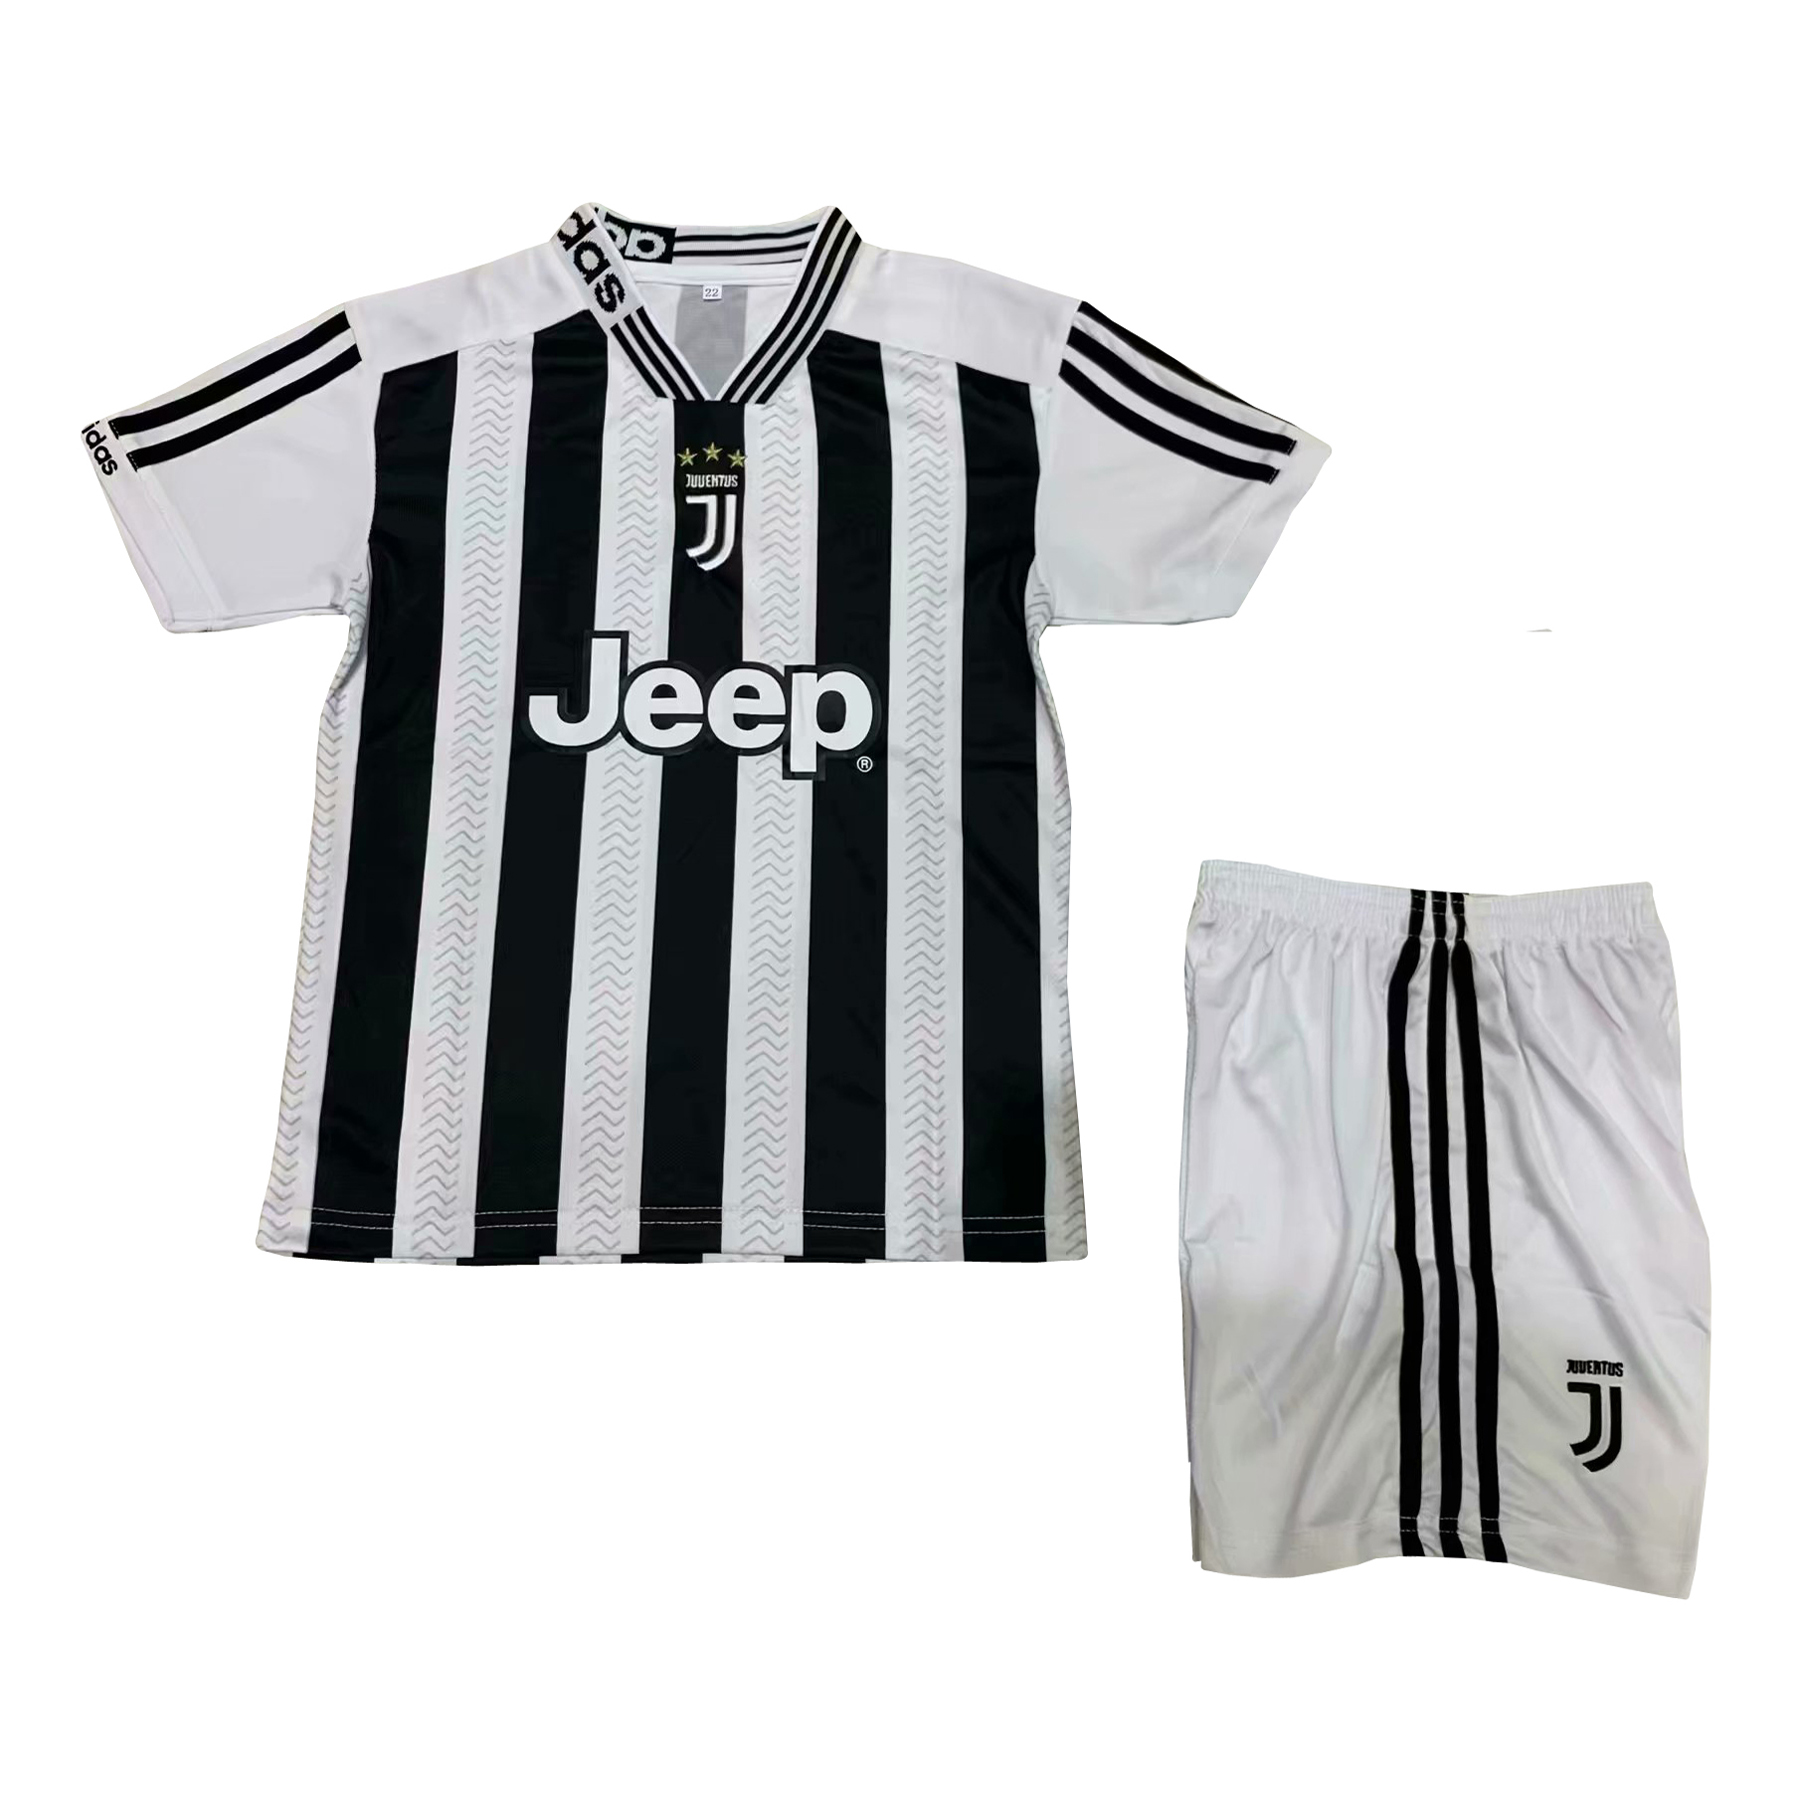 085f67f78 US  14.8 - Juventus Saintetixx Concept Home Jersey Kids  2019 20 -  www.fcsoccerworld.com